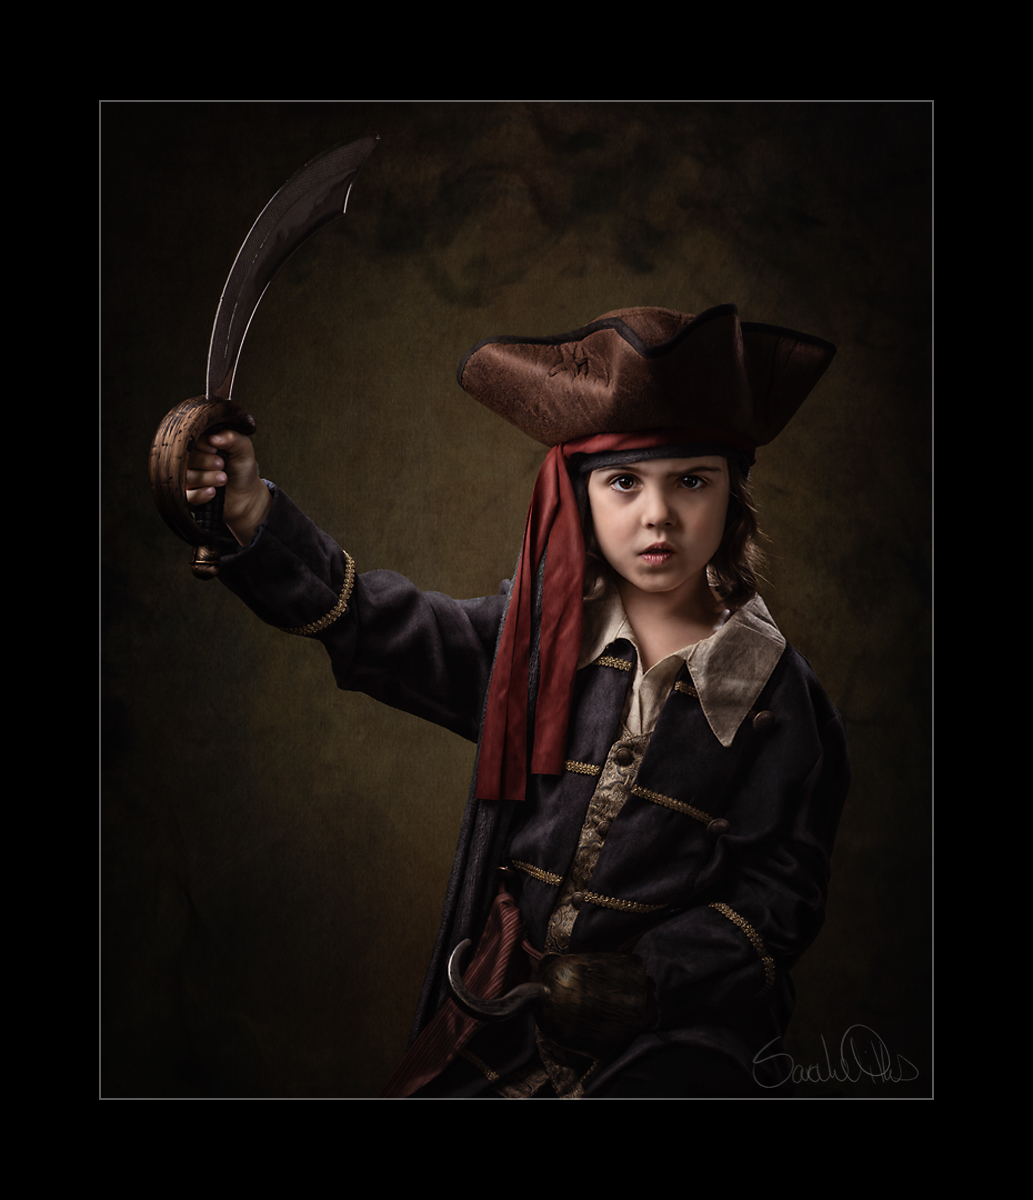 Pirate 006.jpg